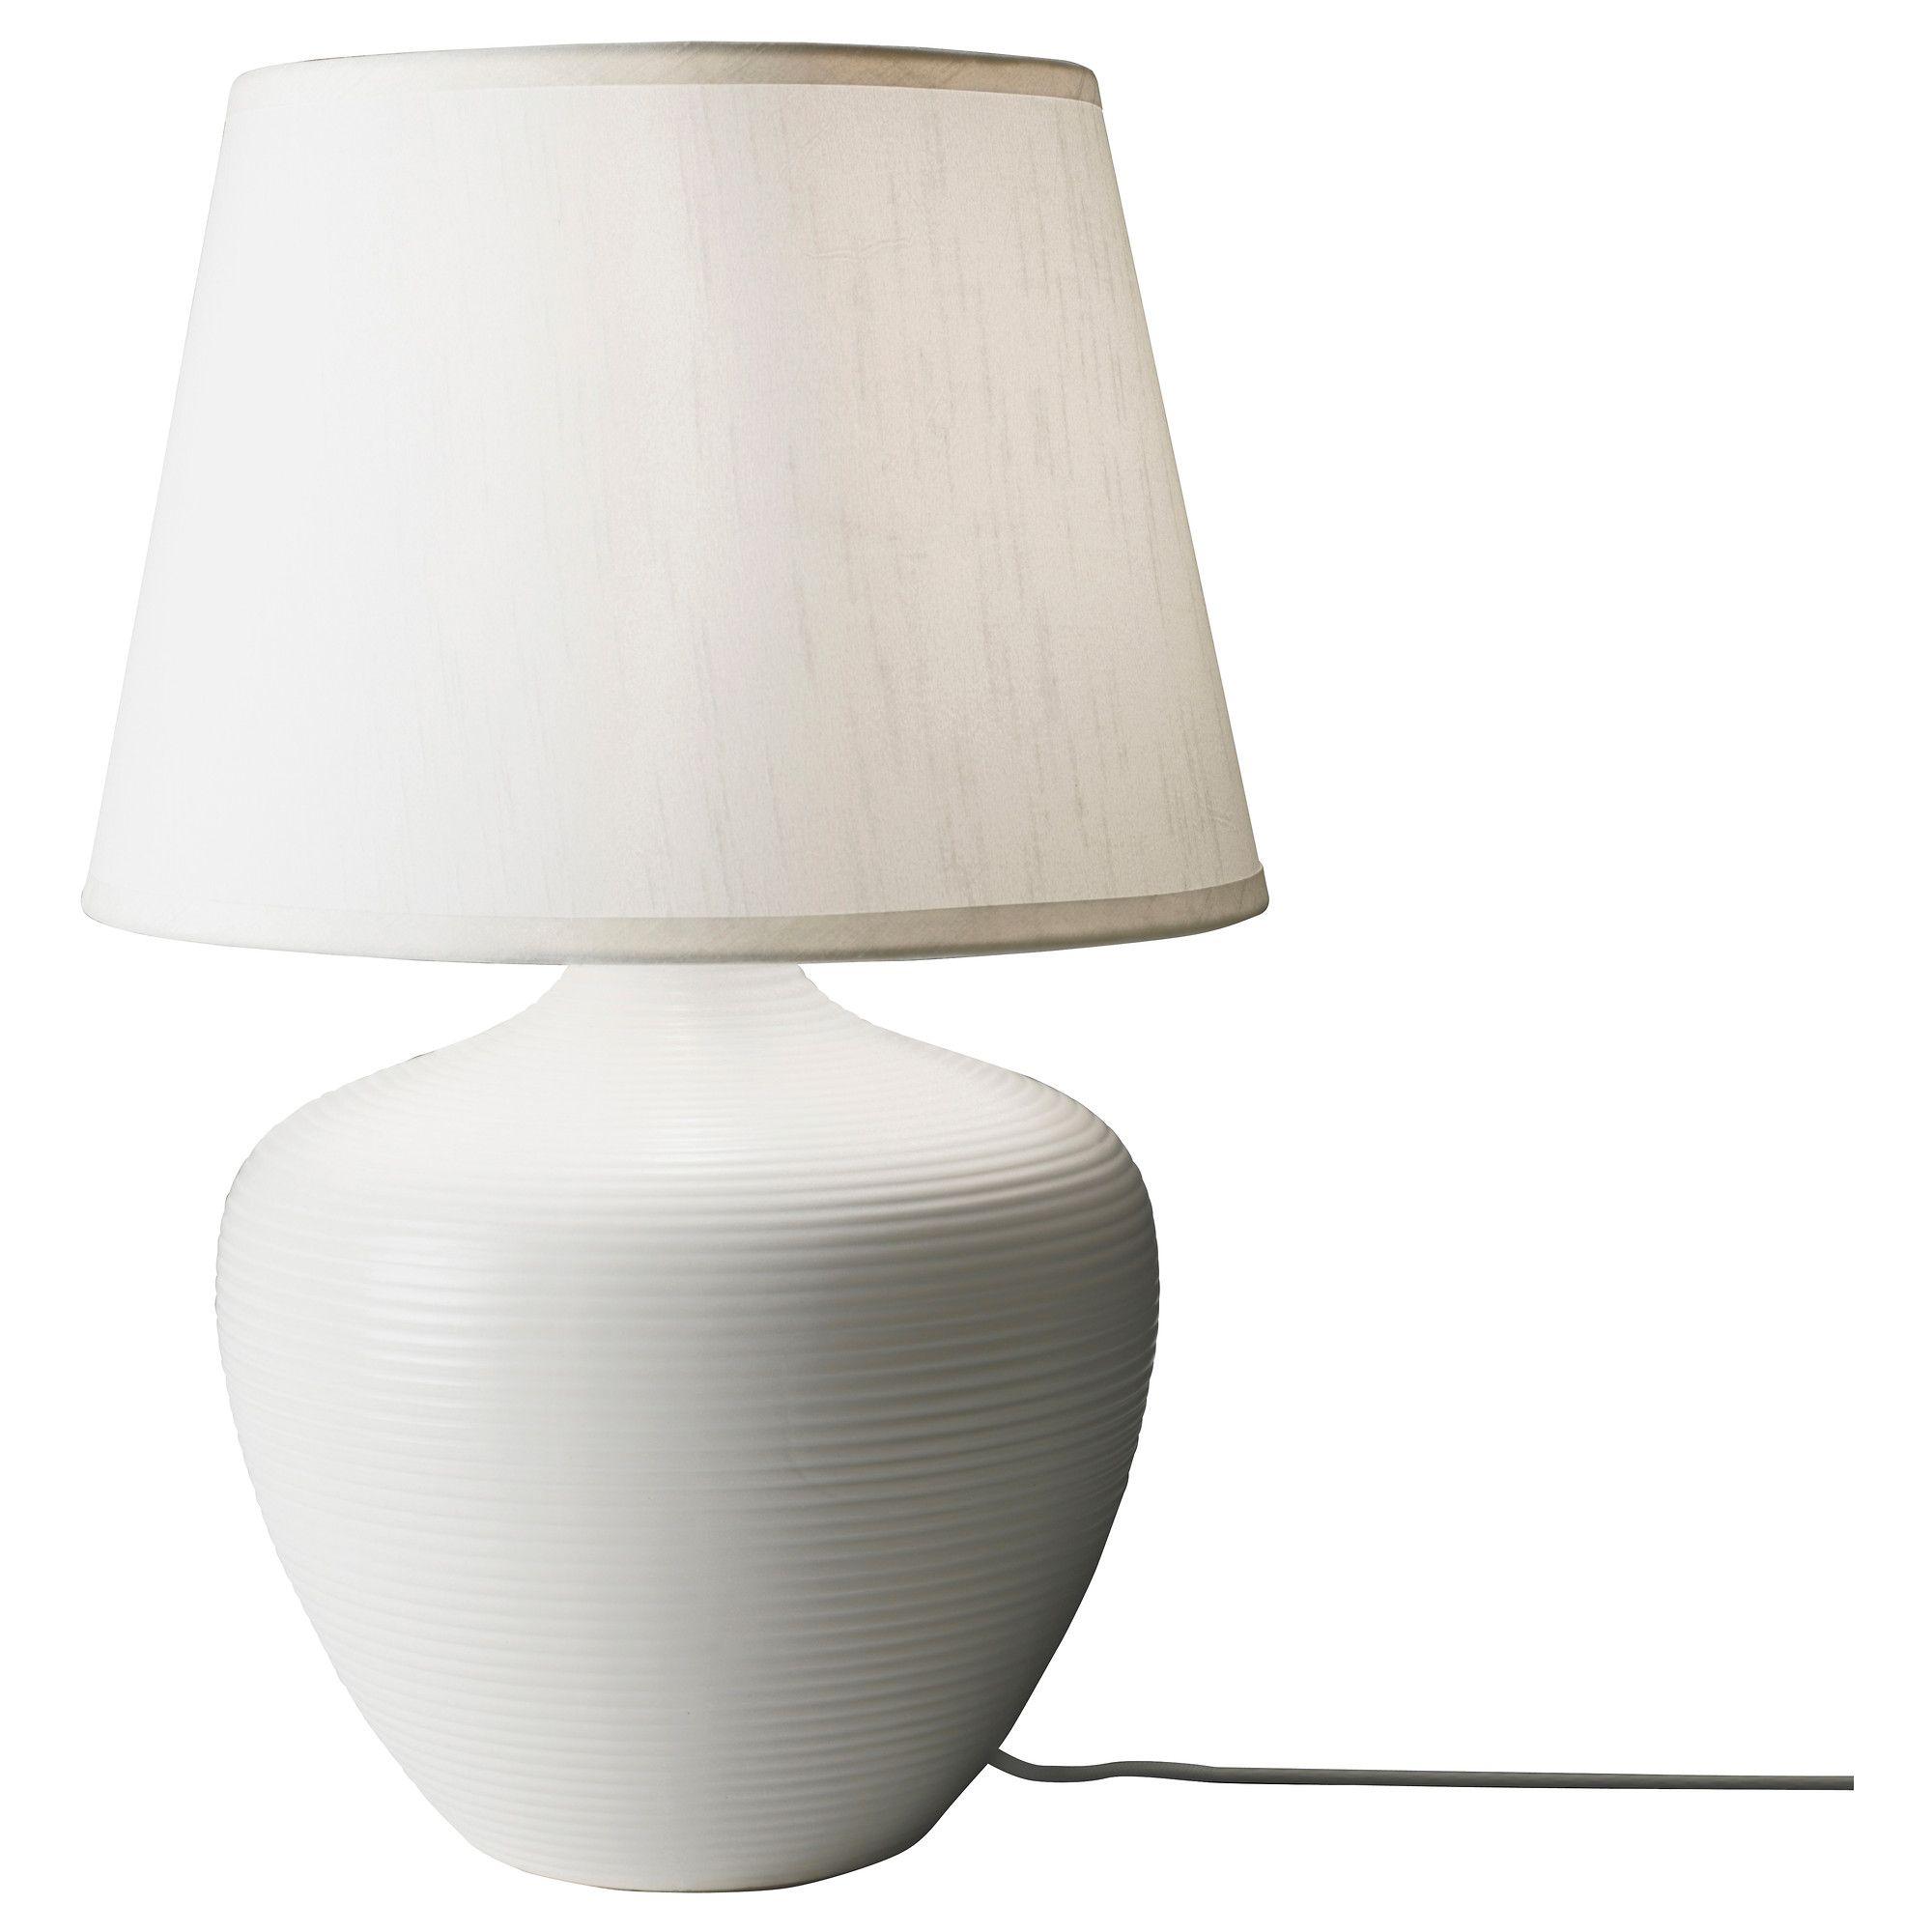 JONSBO GRYBY Tafellamp  IKEA  Huis  Interieur  Huis